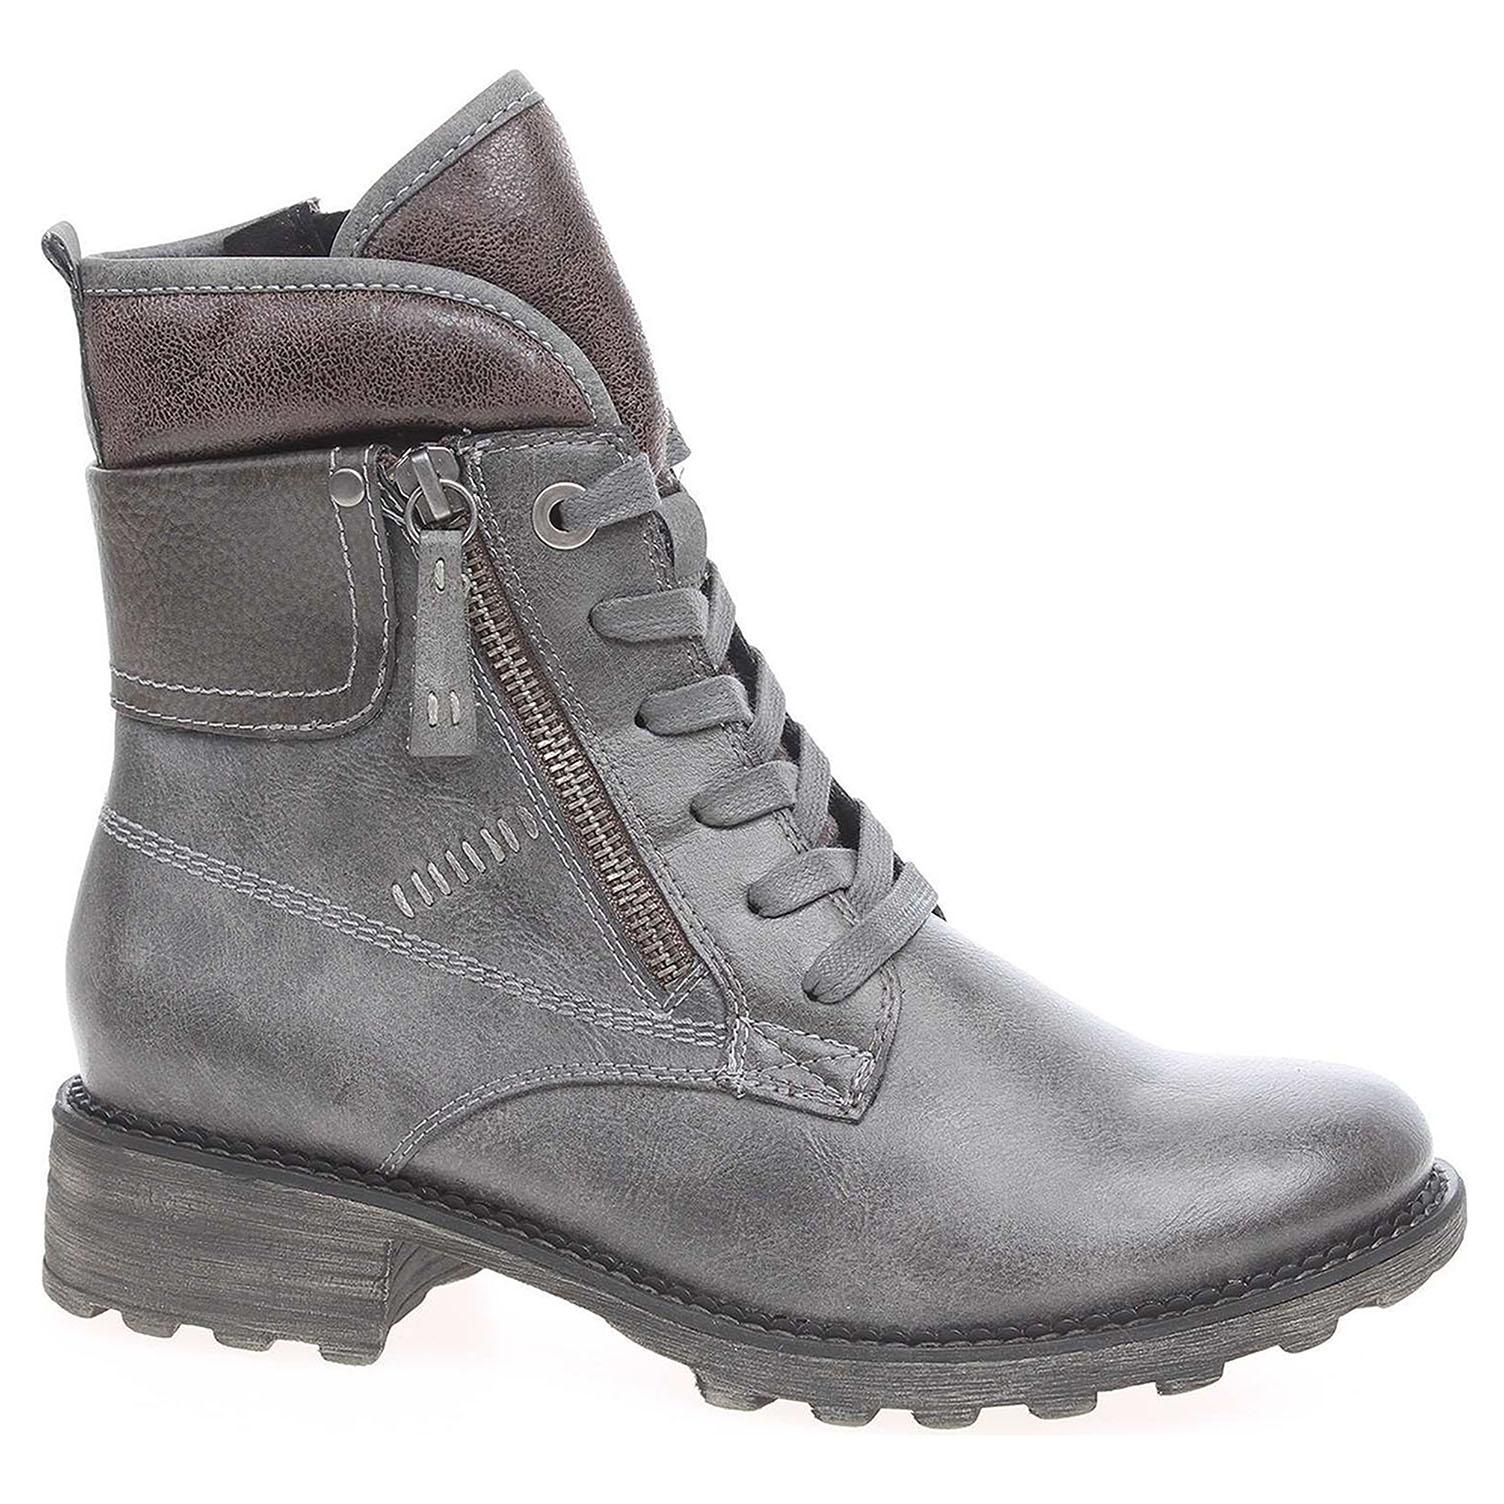 5995bff275ea Ecco Dámská kotníková obuv Tamaris 1-26248-29 šedé 22400564